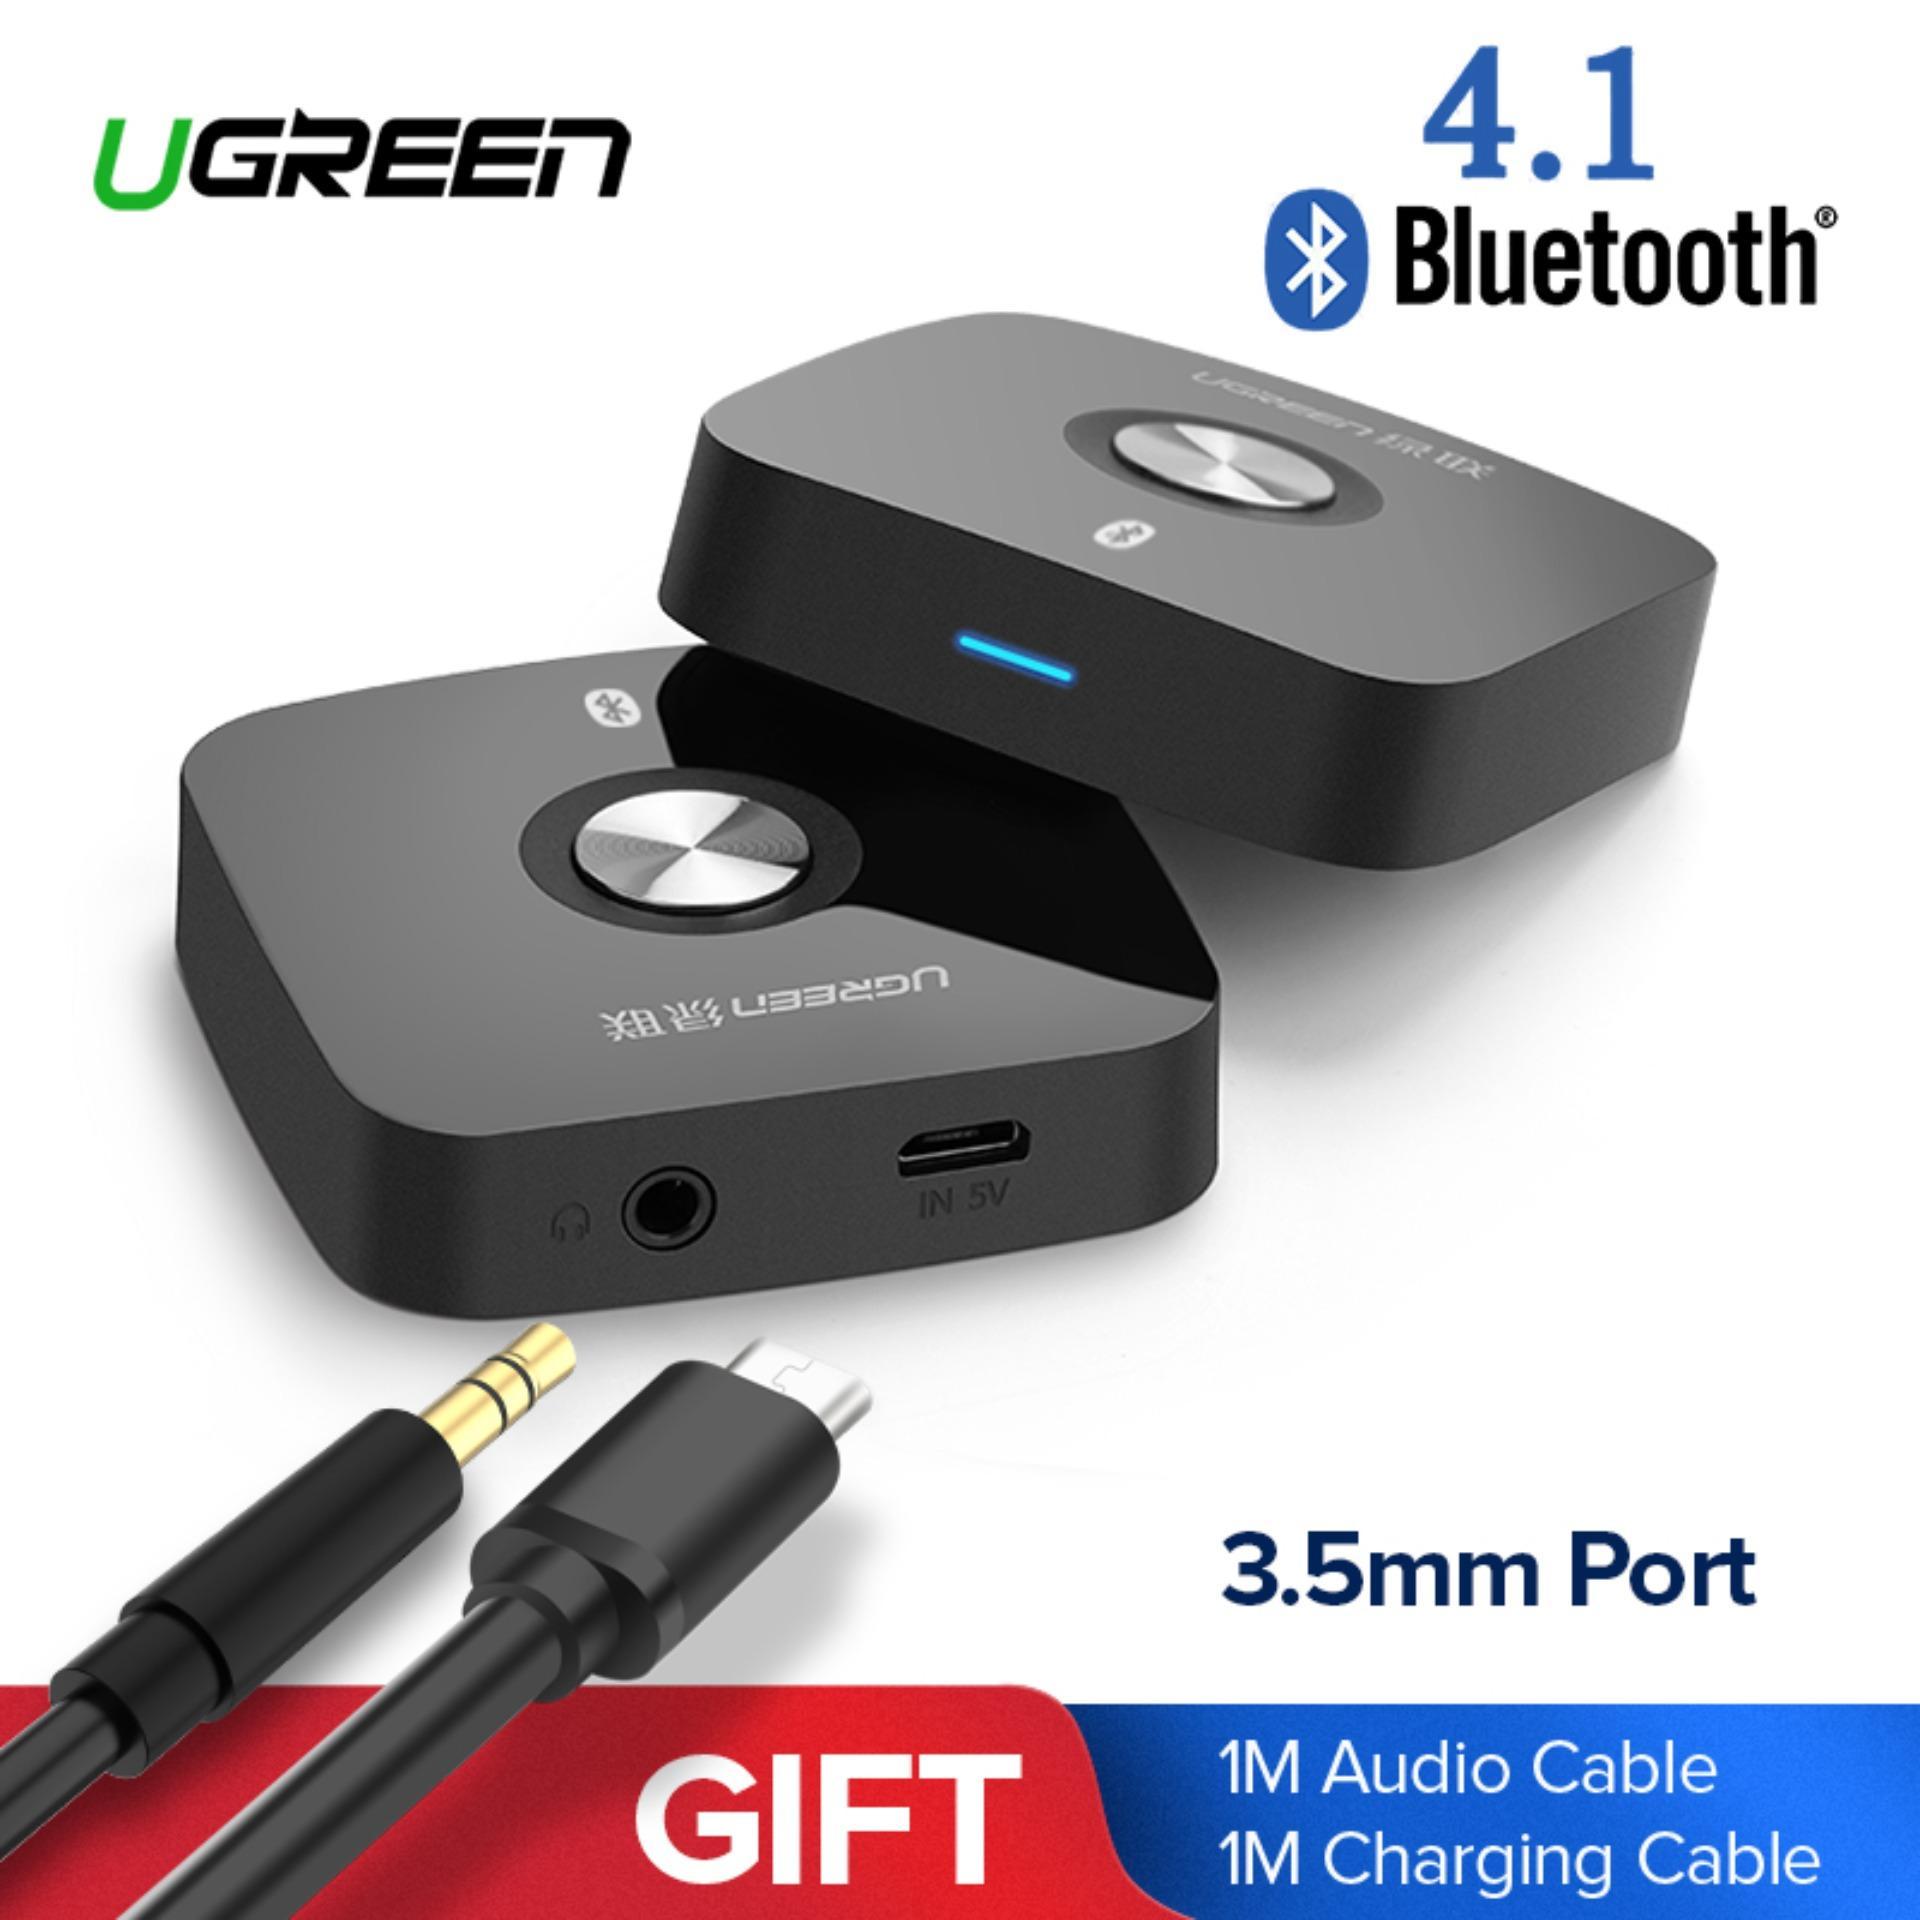 UGREEN Mini Bluetooh 4.1 Audio Receiver Wireless Adapter for Home Audio Music Car Speakerphone